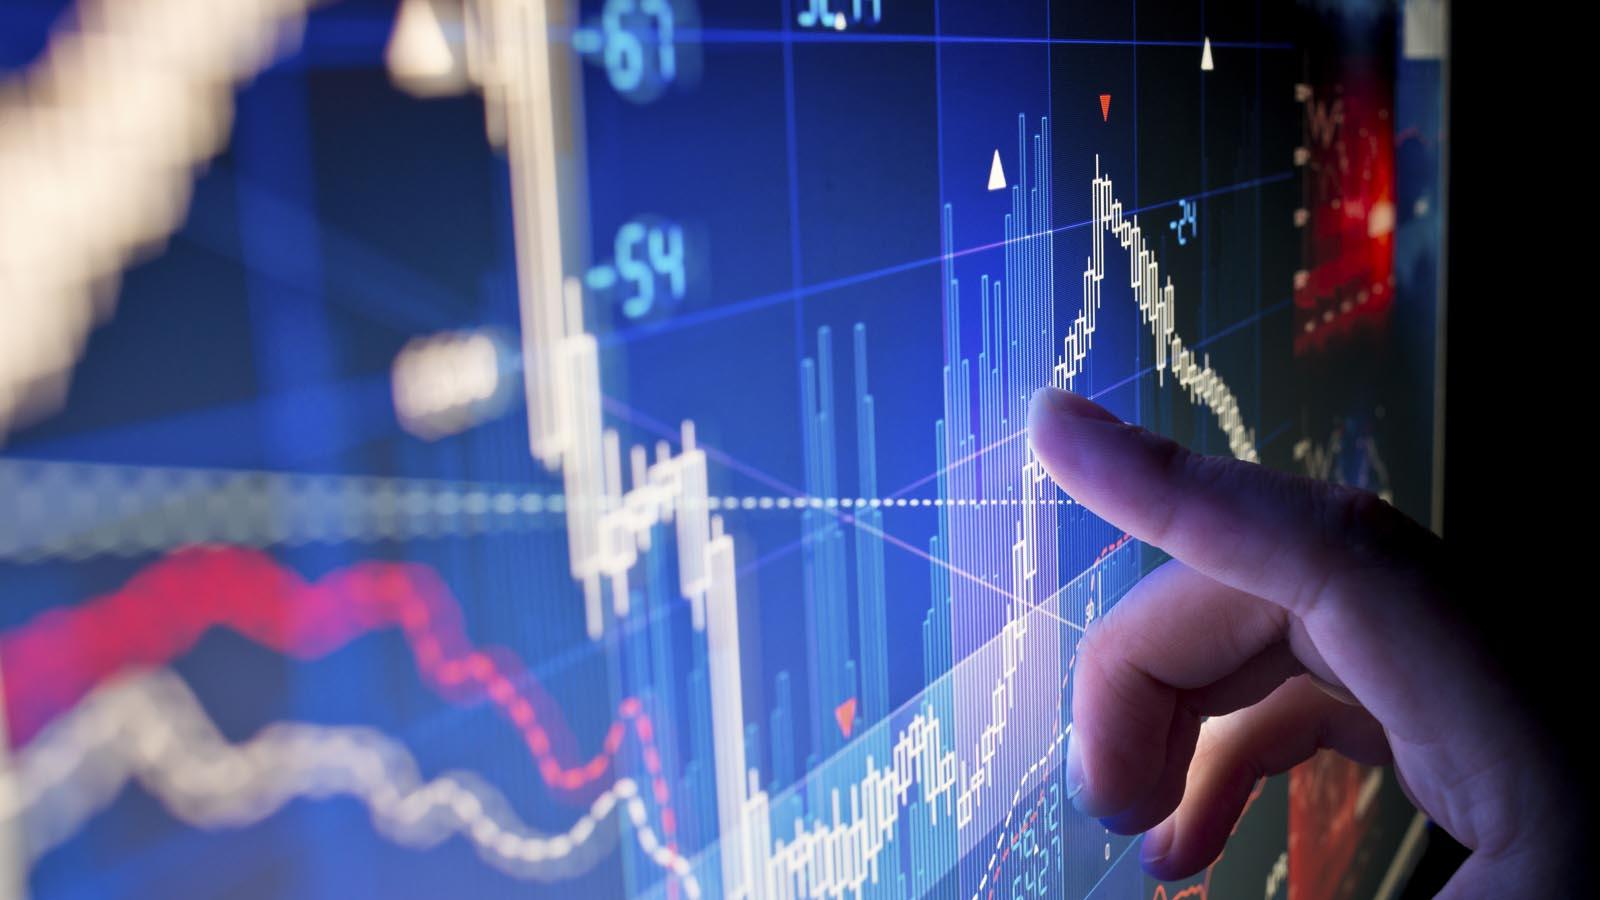 Using advanced analytics to better understand customers